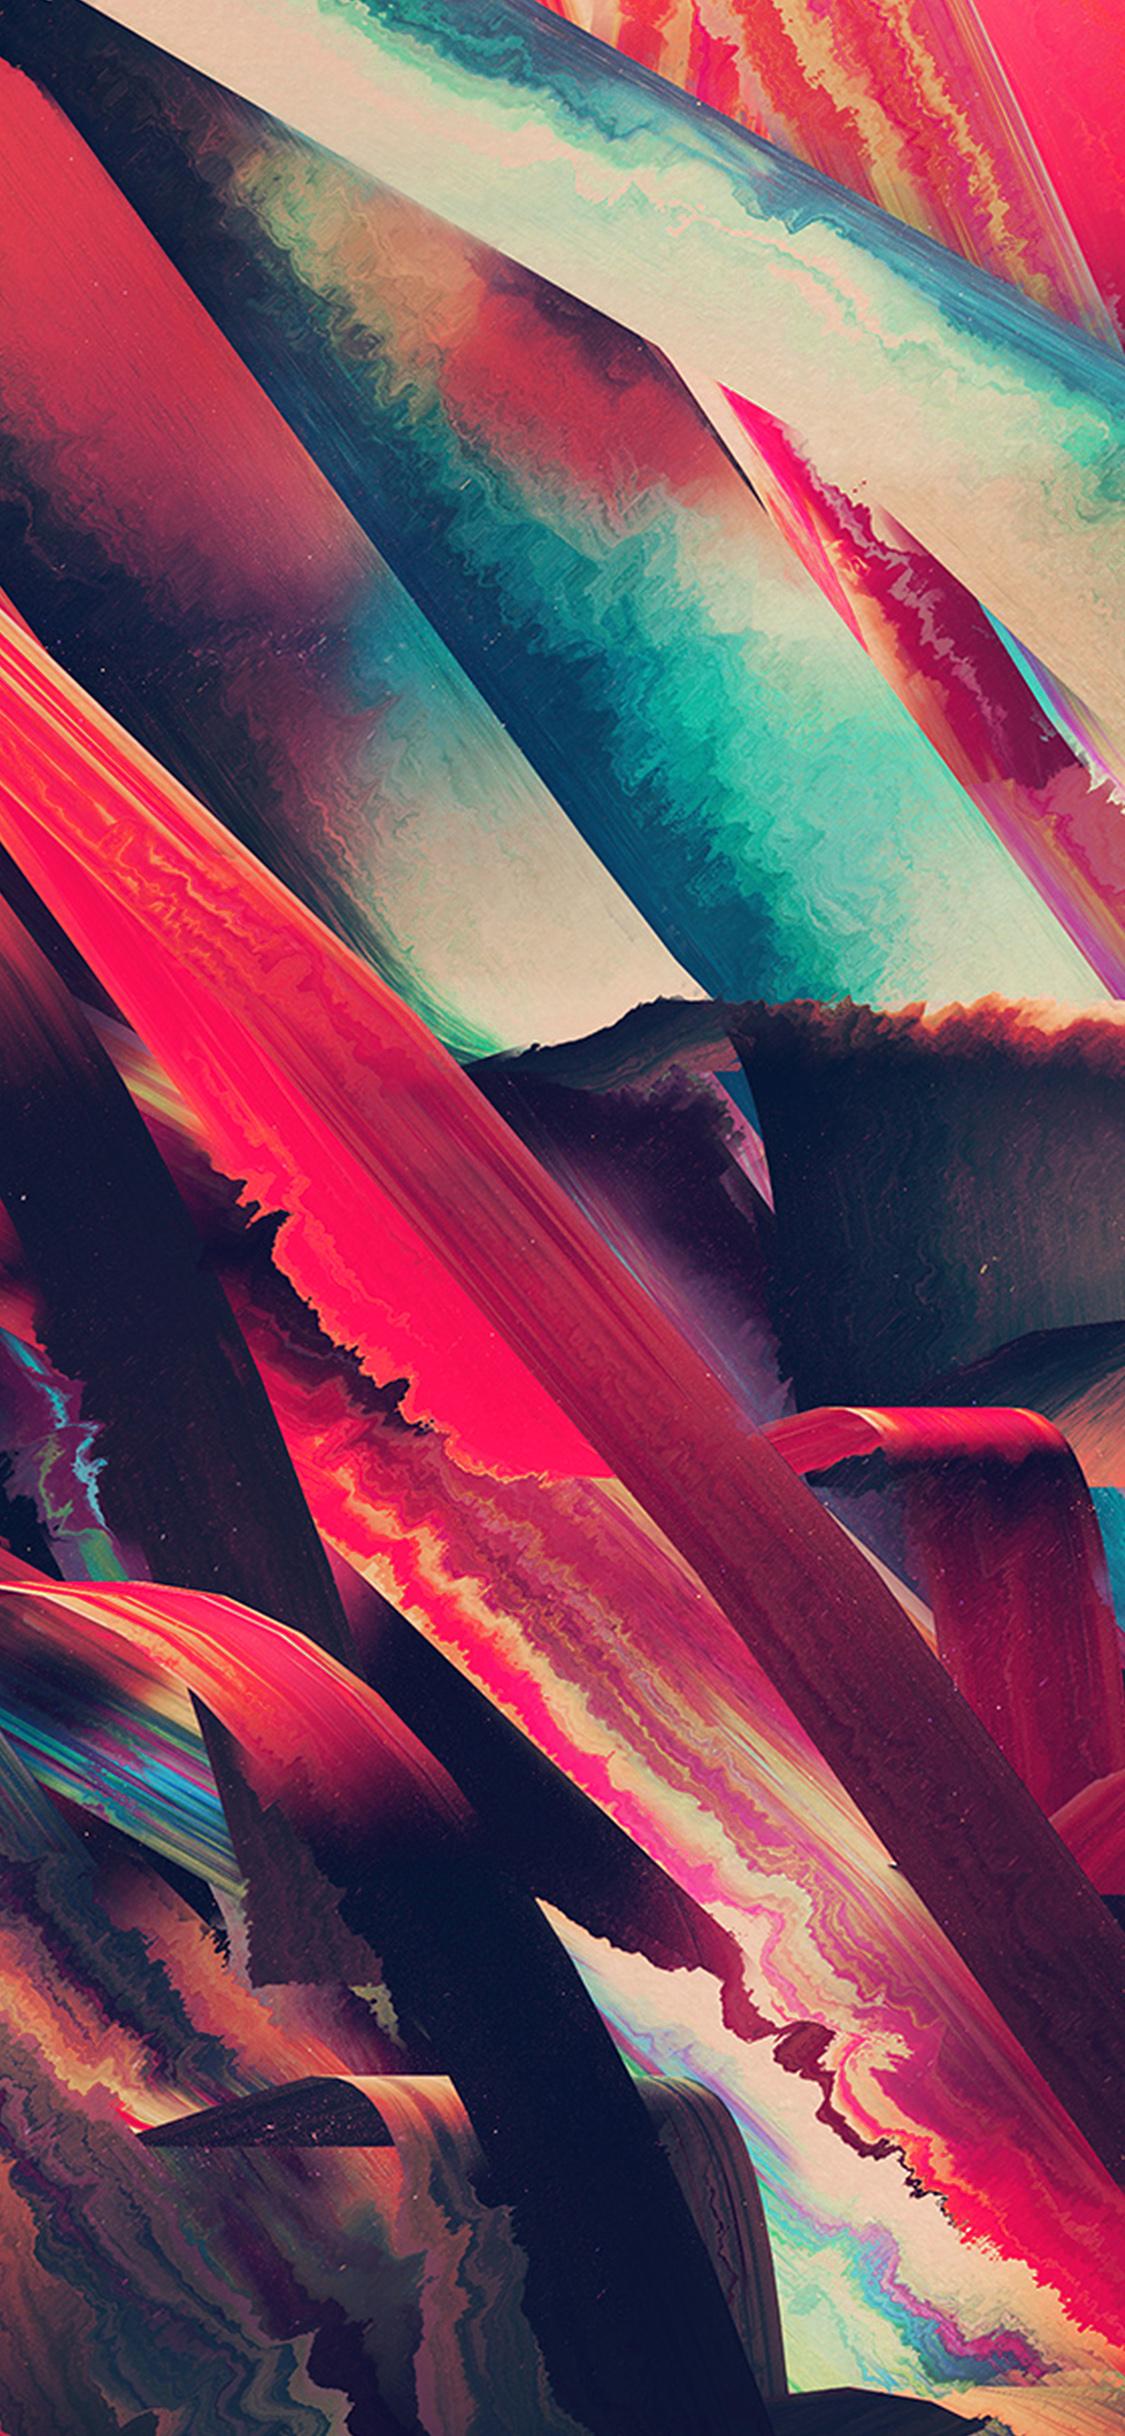 iPhonexpapers.com-Apple-iPhone-wallpaper-vt45-art-paint-hampus-olsson-pattern-red-dark-abstract-blue